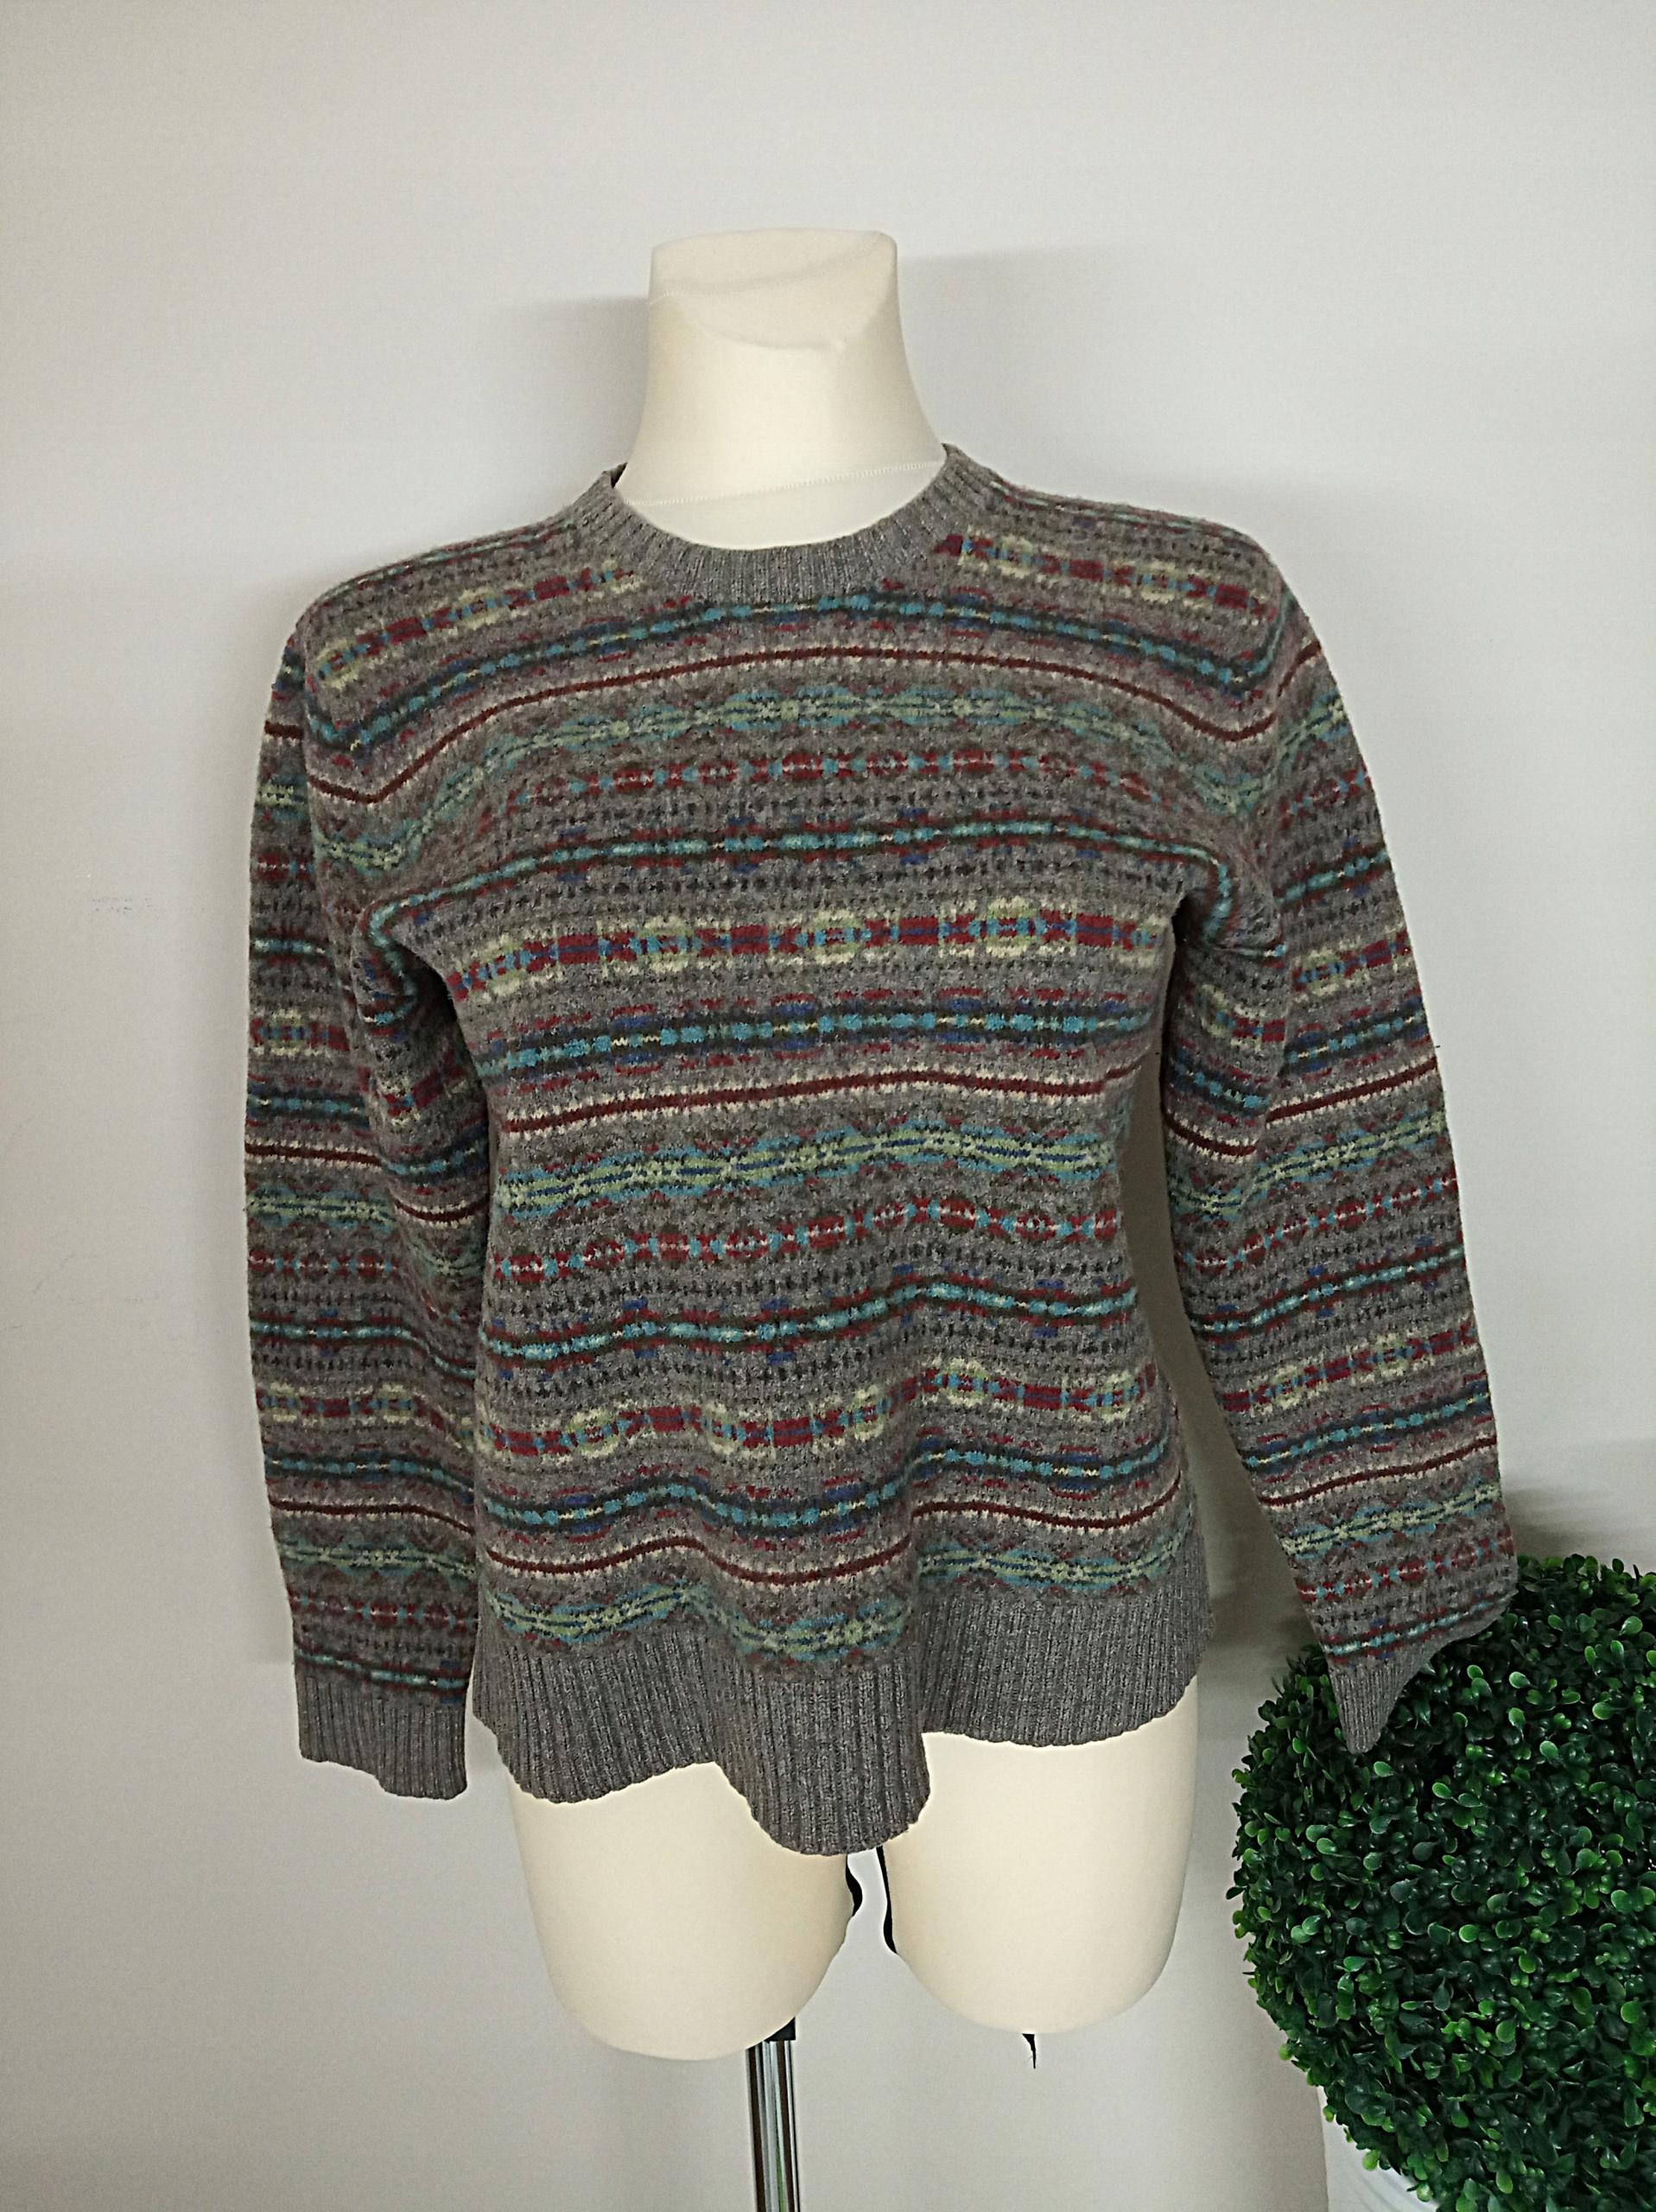 Swetr sweter POLO RALPH LAUREN XL 100% Wełna góry